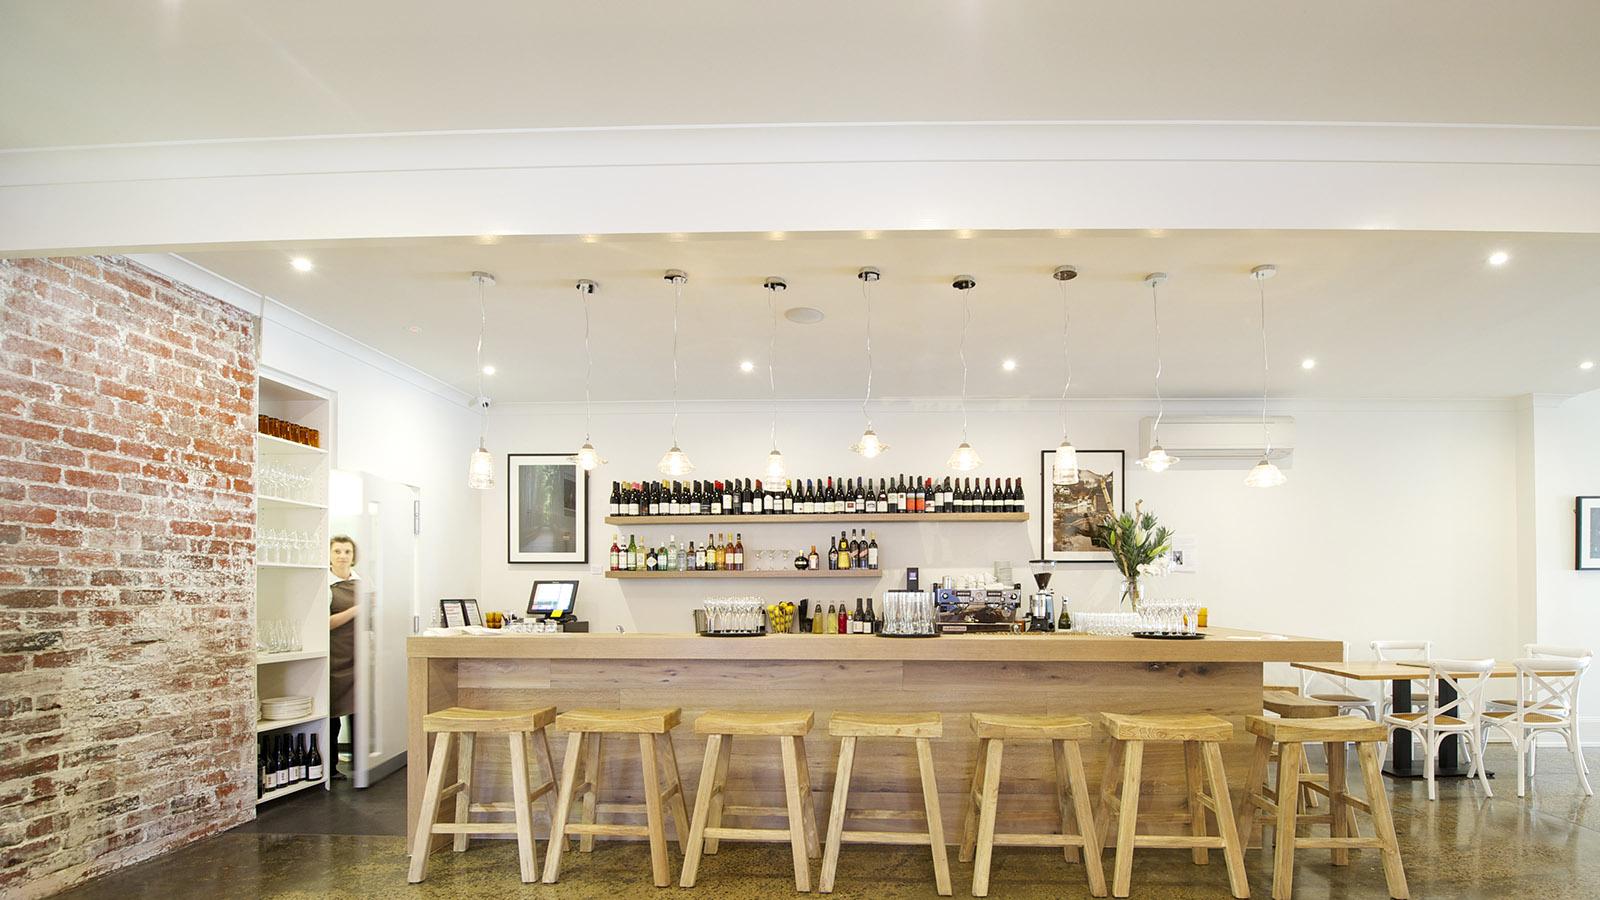 Tulip Restaurant, Geelong and the Bellarine, Victoria, Australia